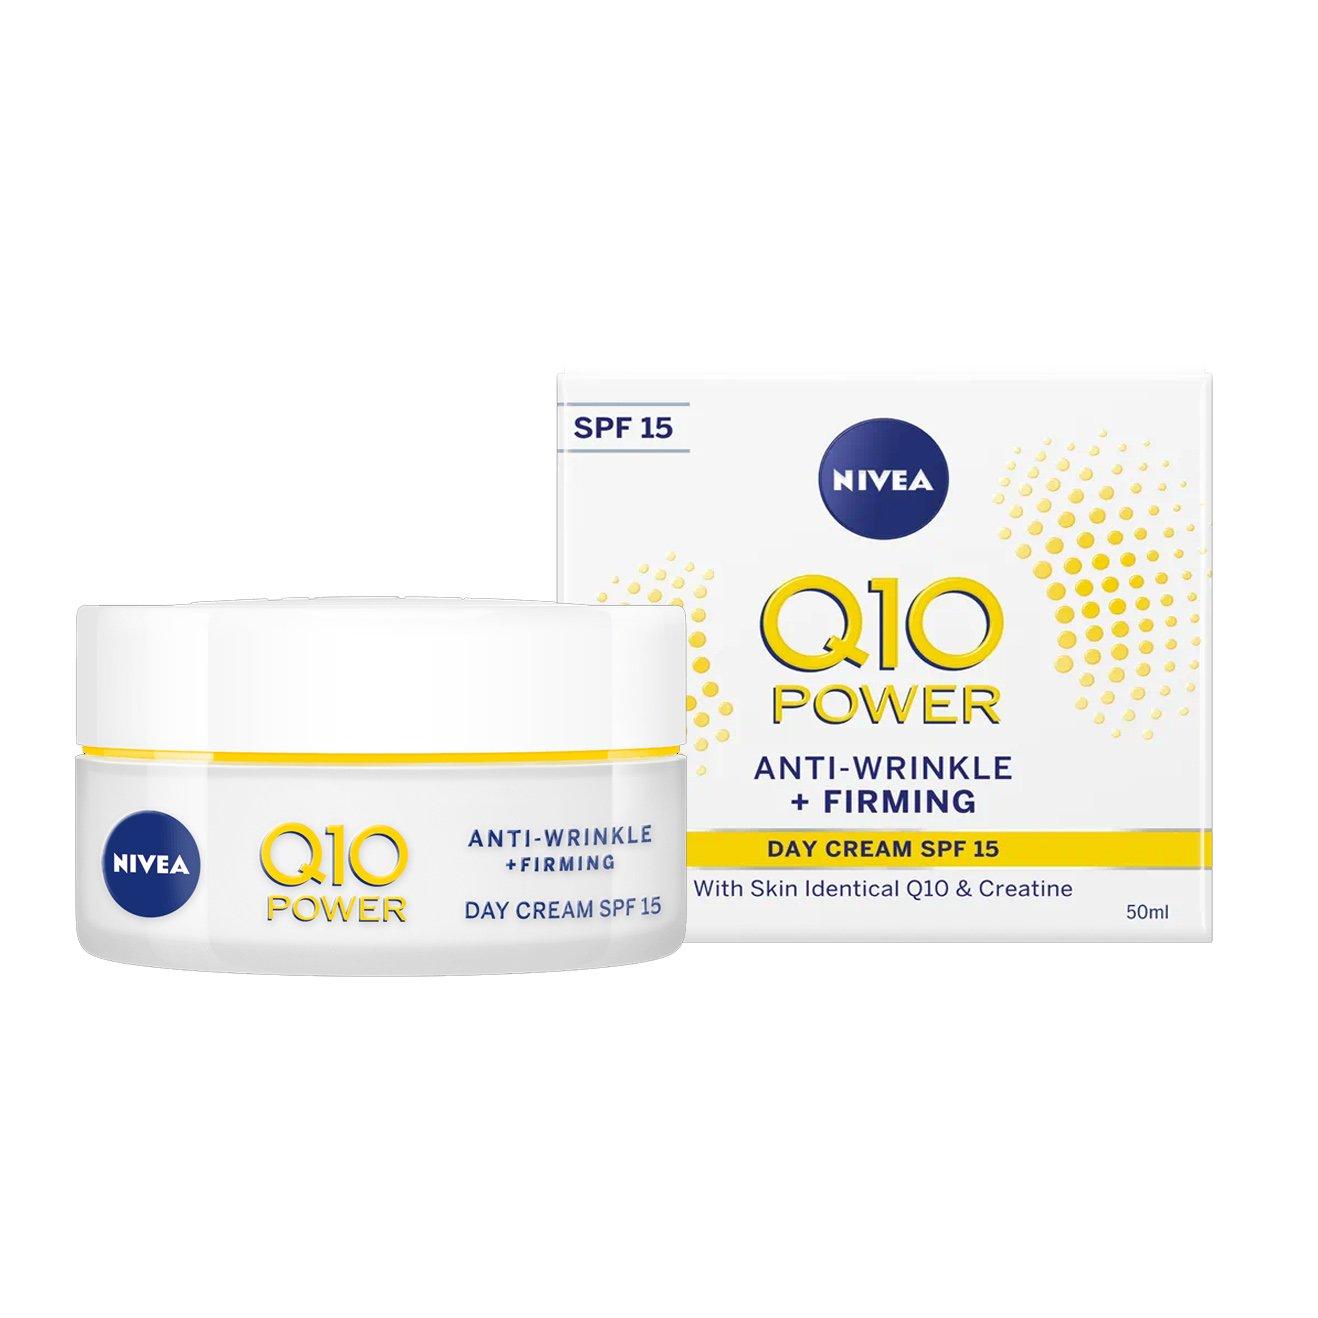 Nivea Q10 Plus Anti-Wrinkle Day Cream Spf15 Αντιρυτιδική Κρέμα Ημέρας με Αντηλιακή Προστασία, για Κάθε Τύπο Δέρματος 50ml